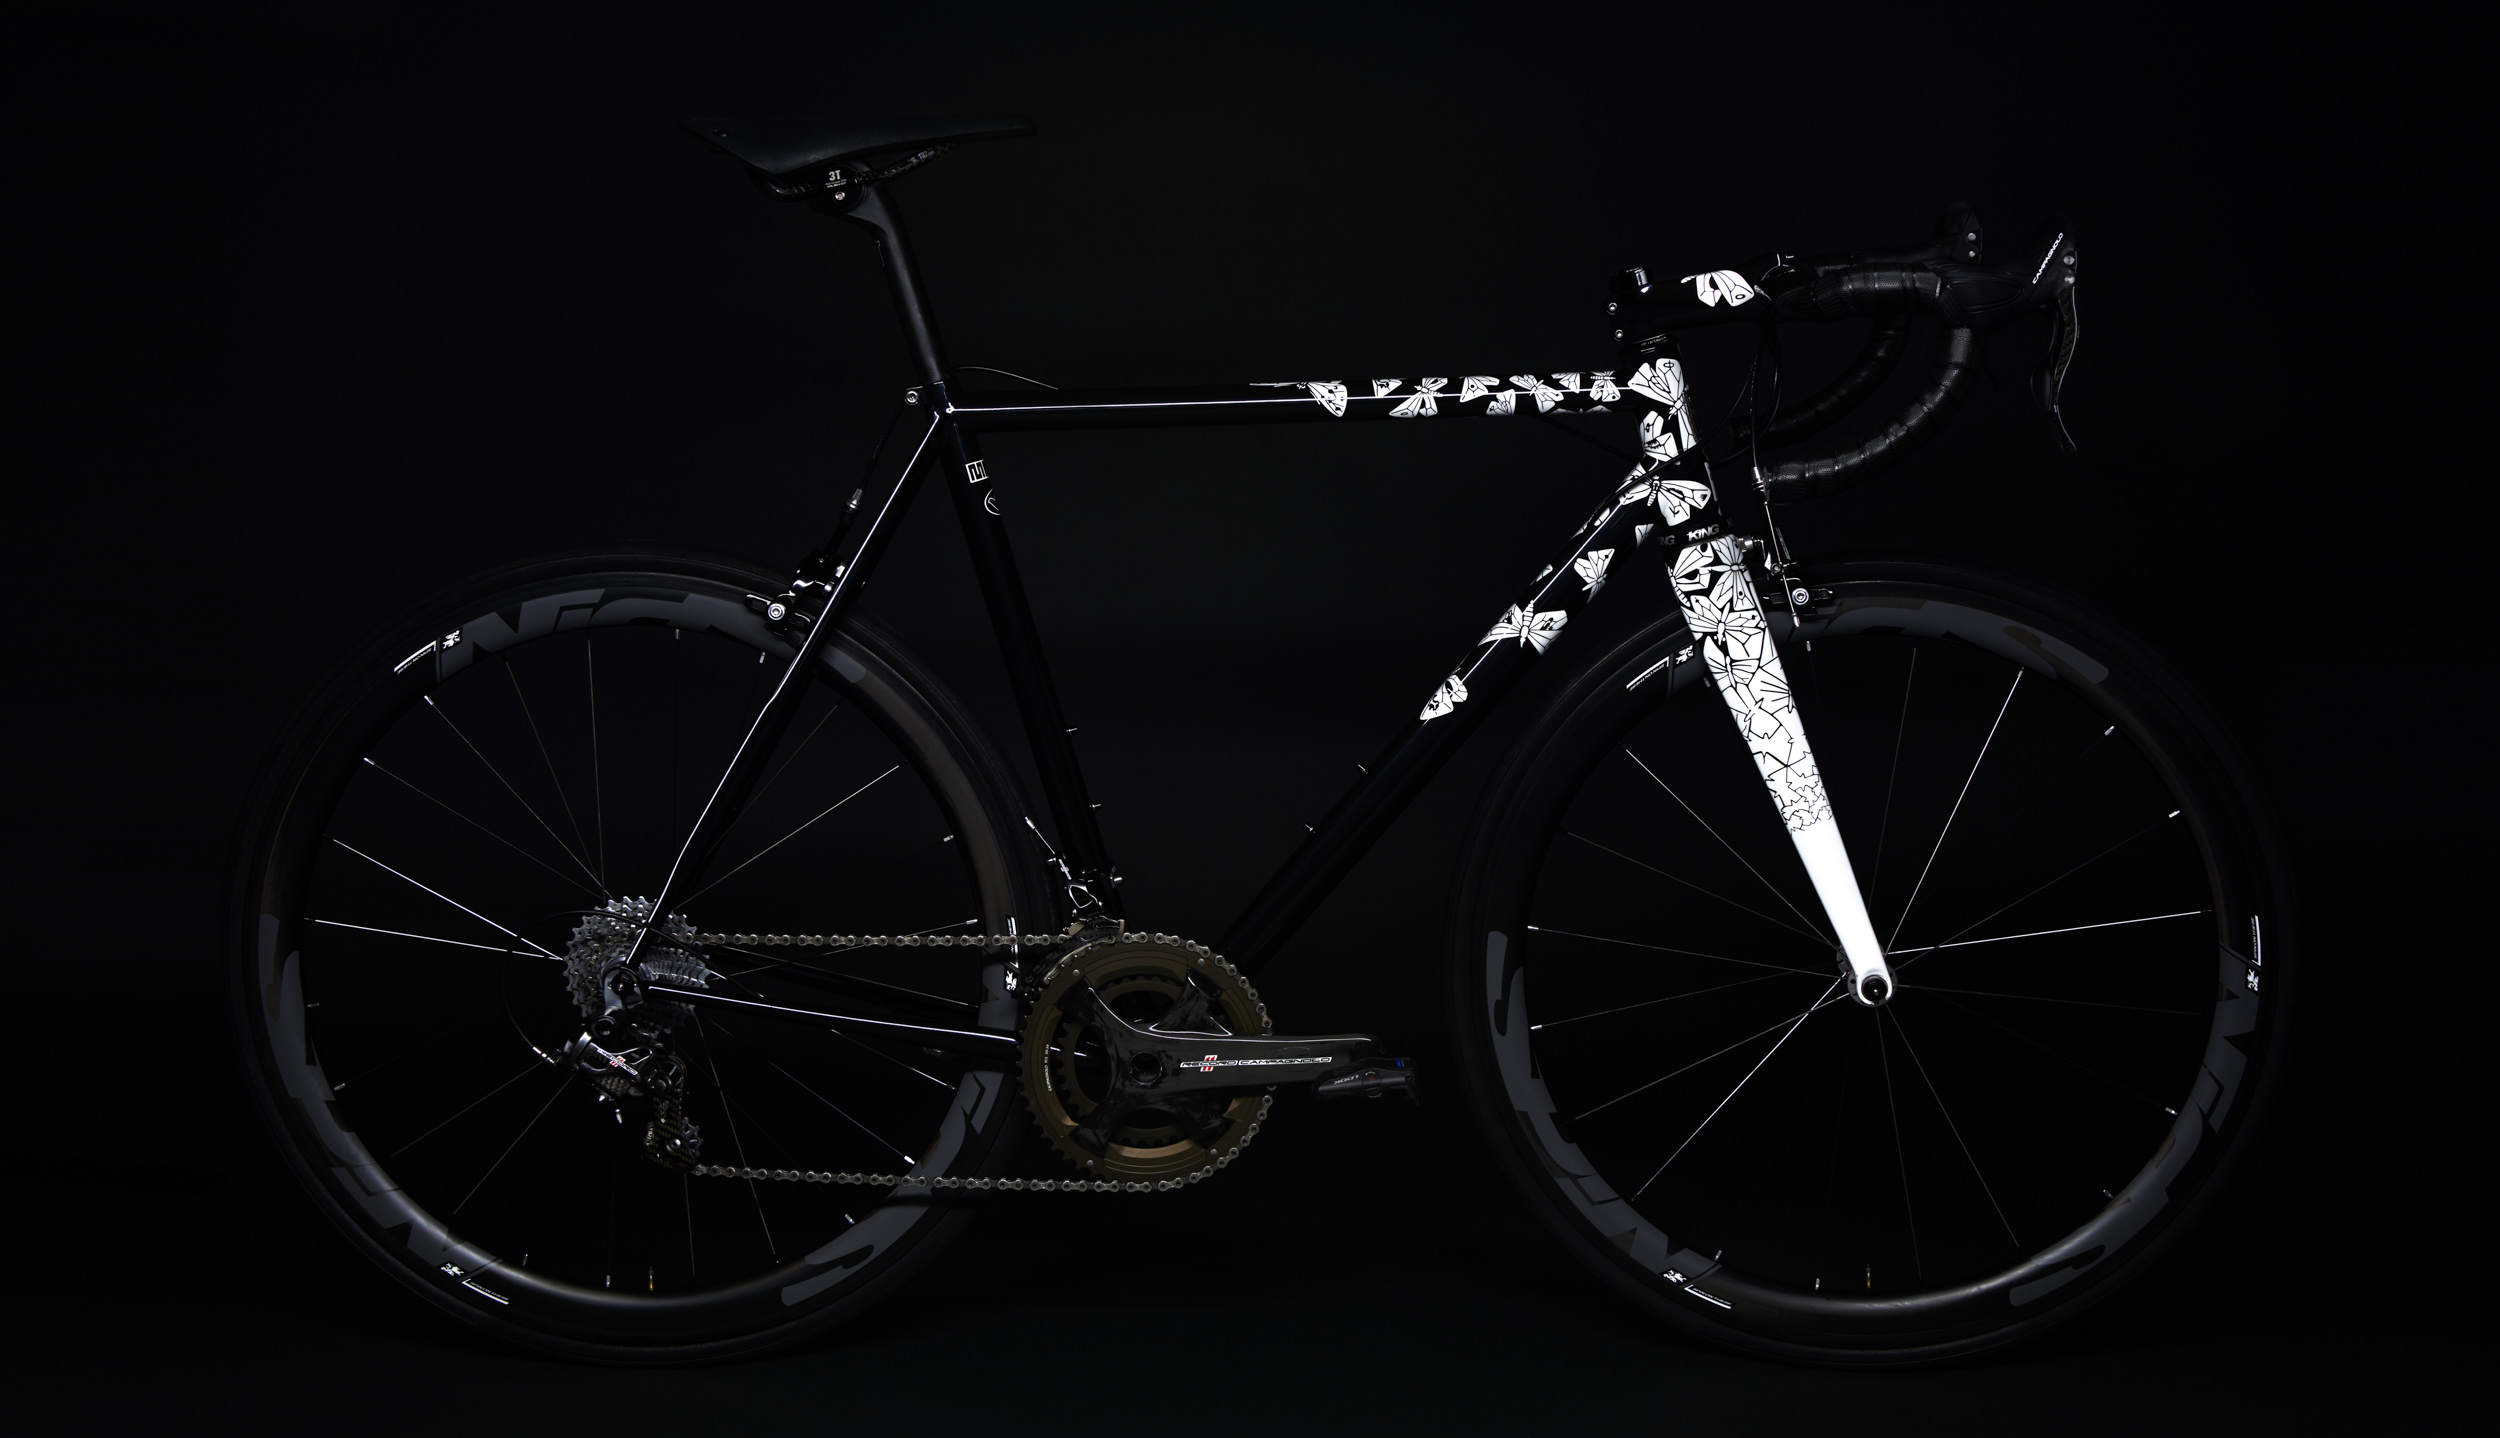 M.C. Escher's 'Butterflies' engineered to the frame of the Spoon Customs Izoard RR race bike